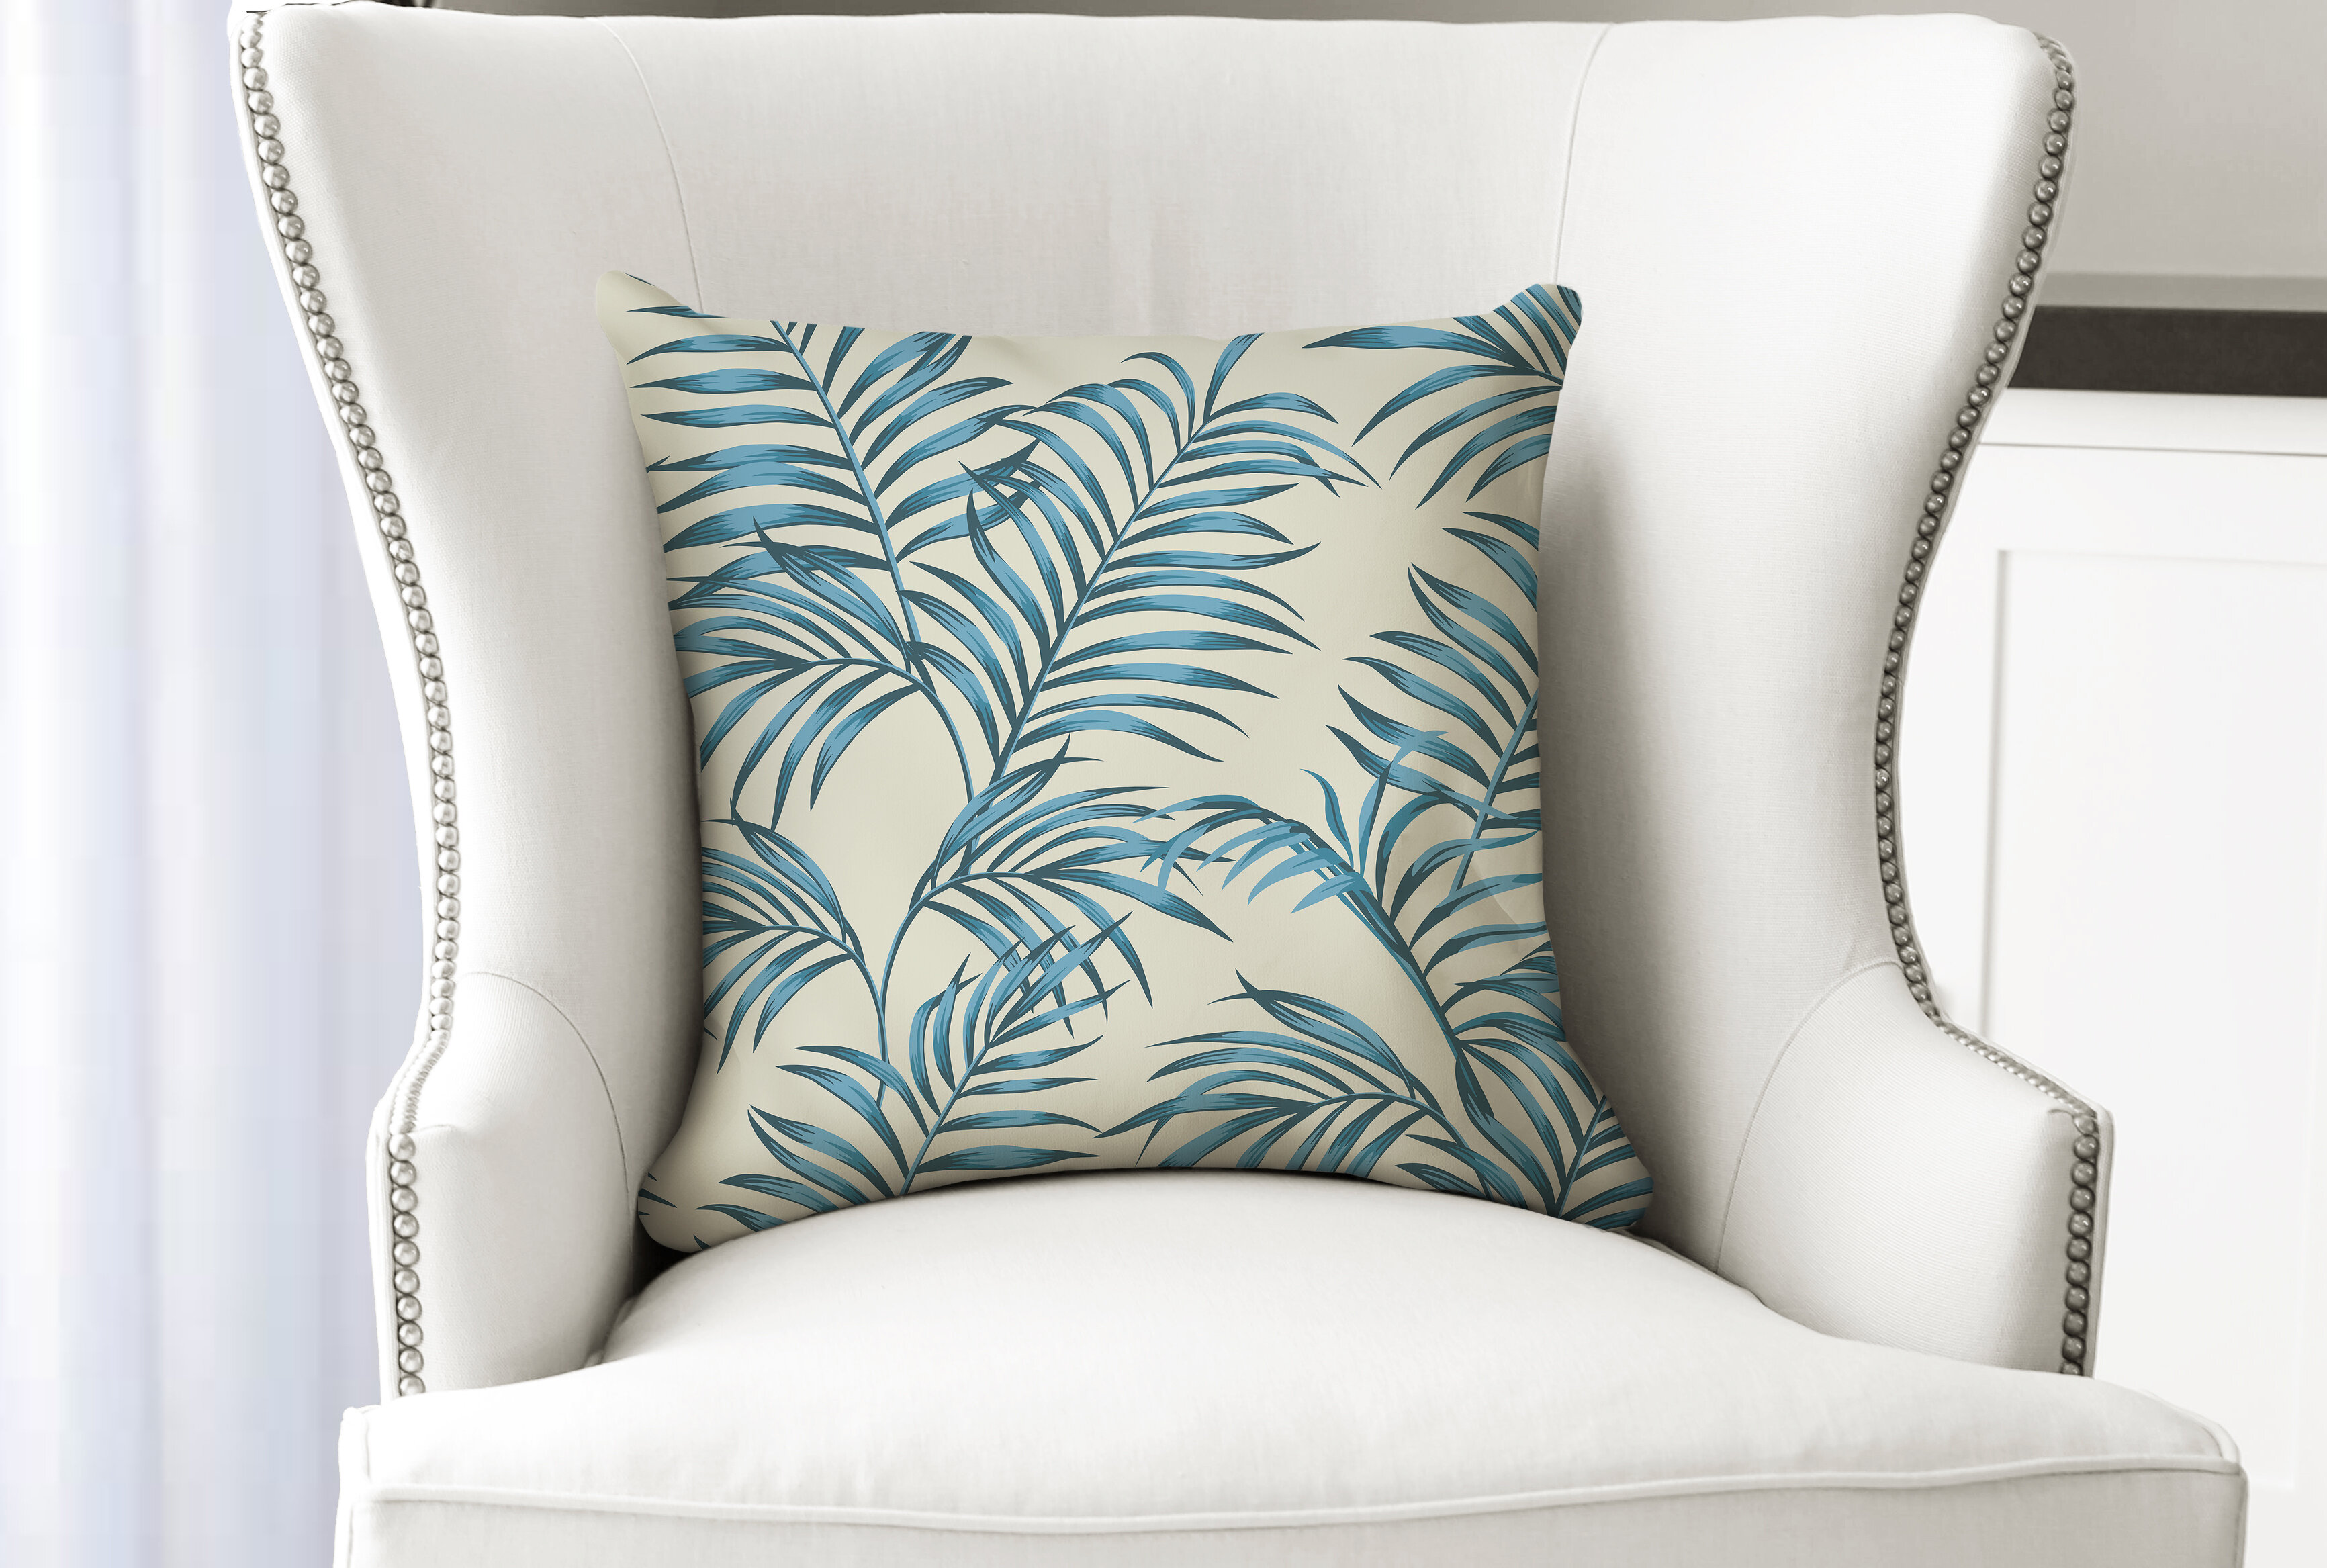 Eco Fill Tropical Throw Pillows You Ll Love In 2021 Wayfair